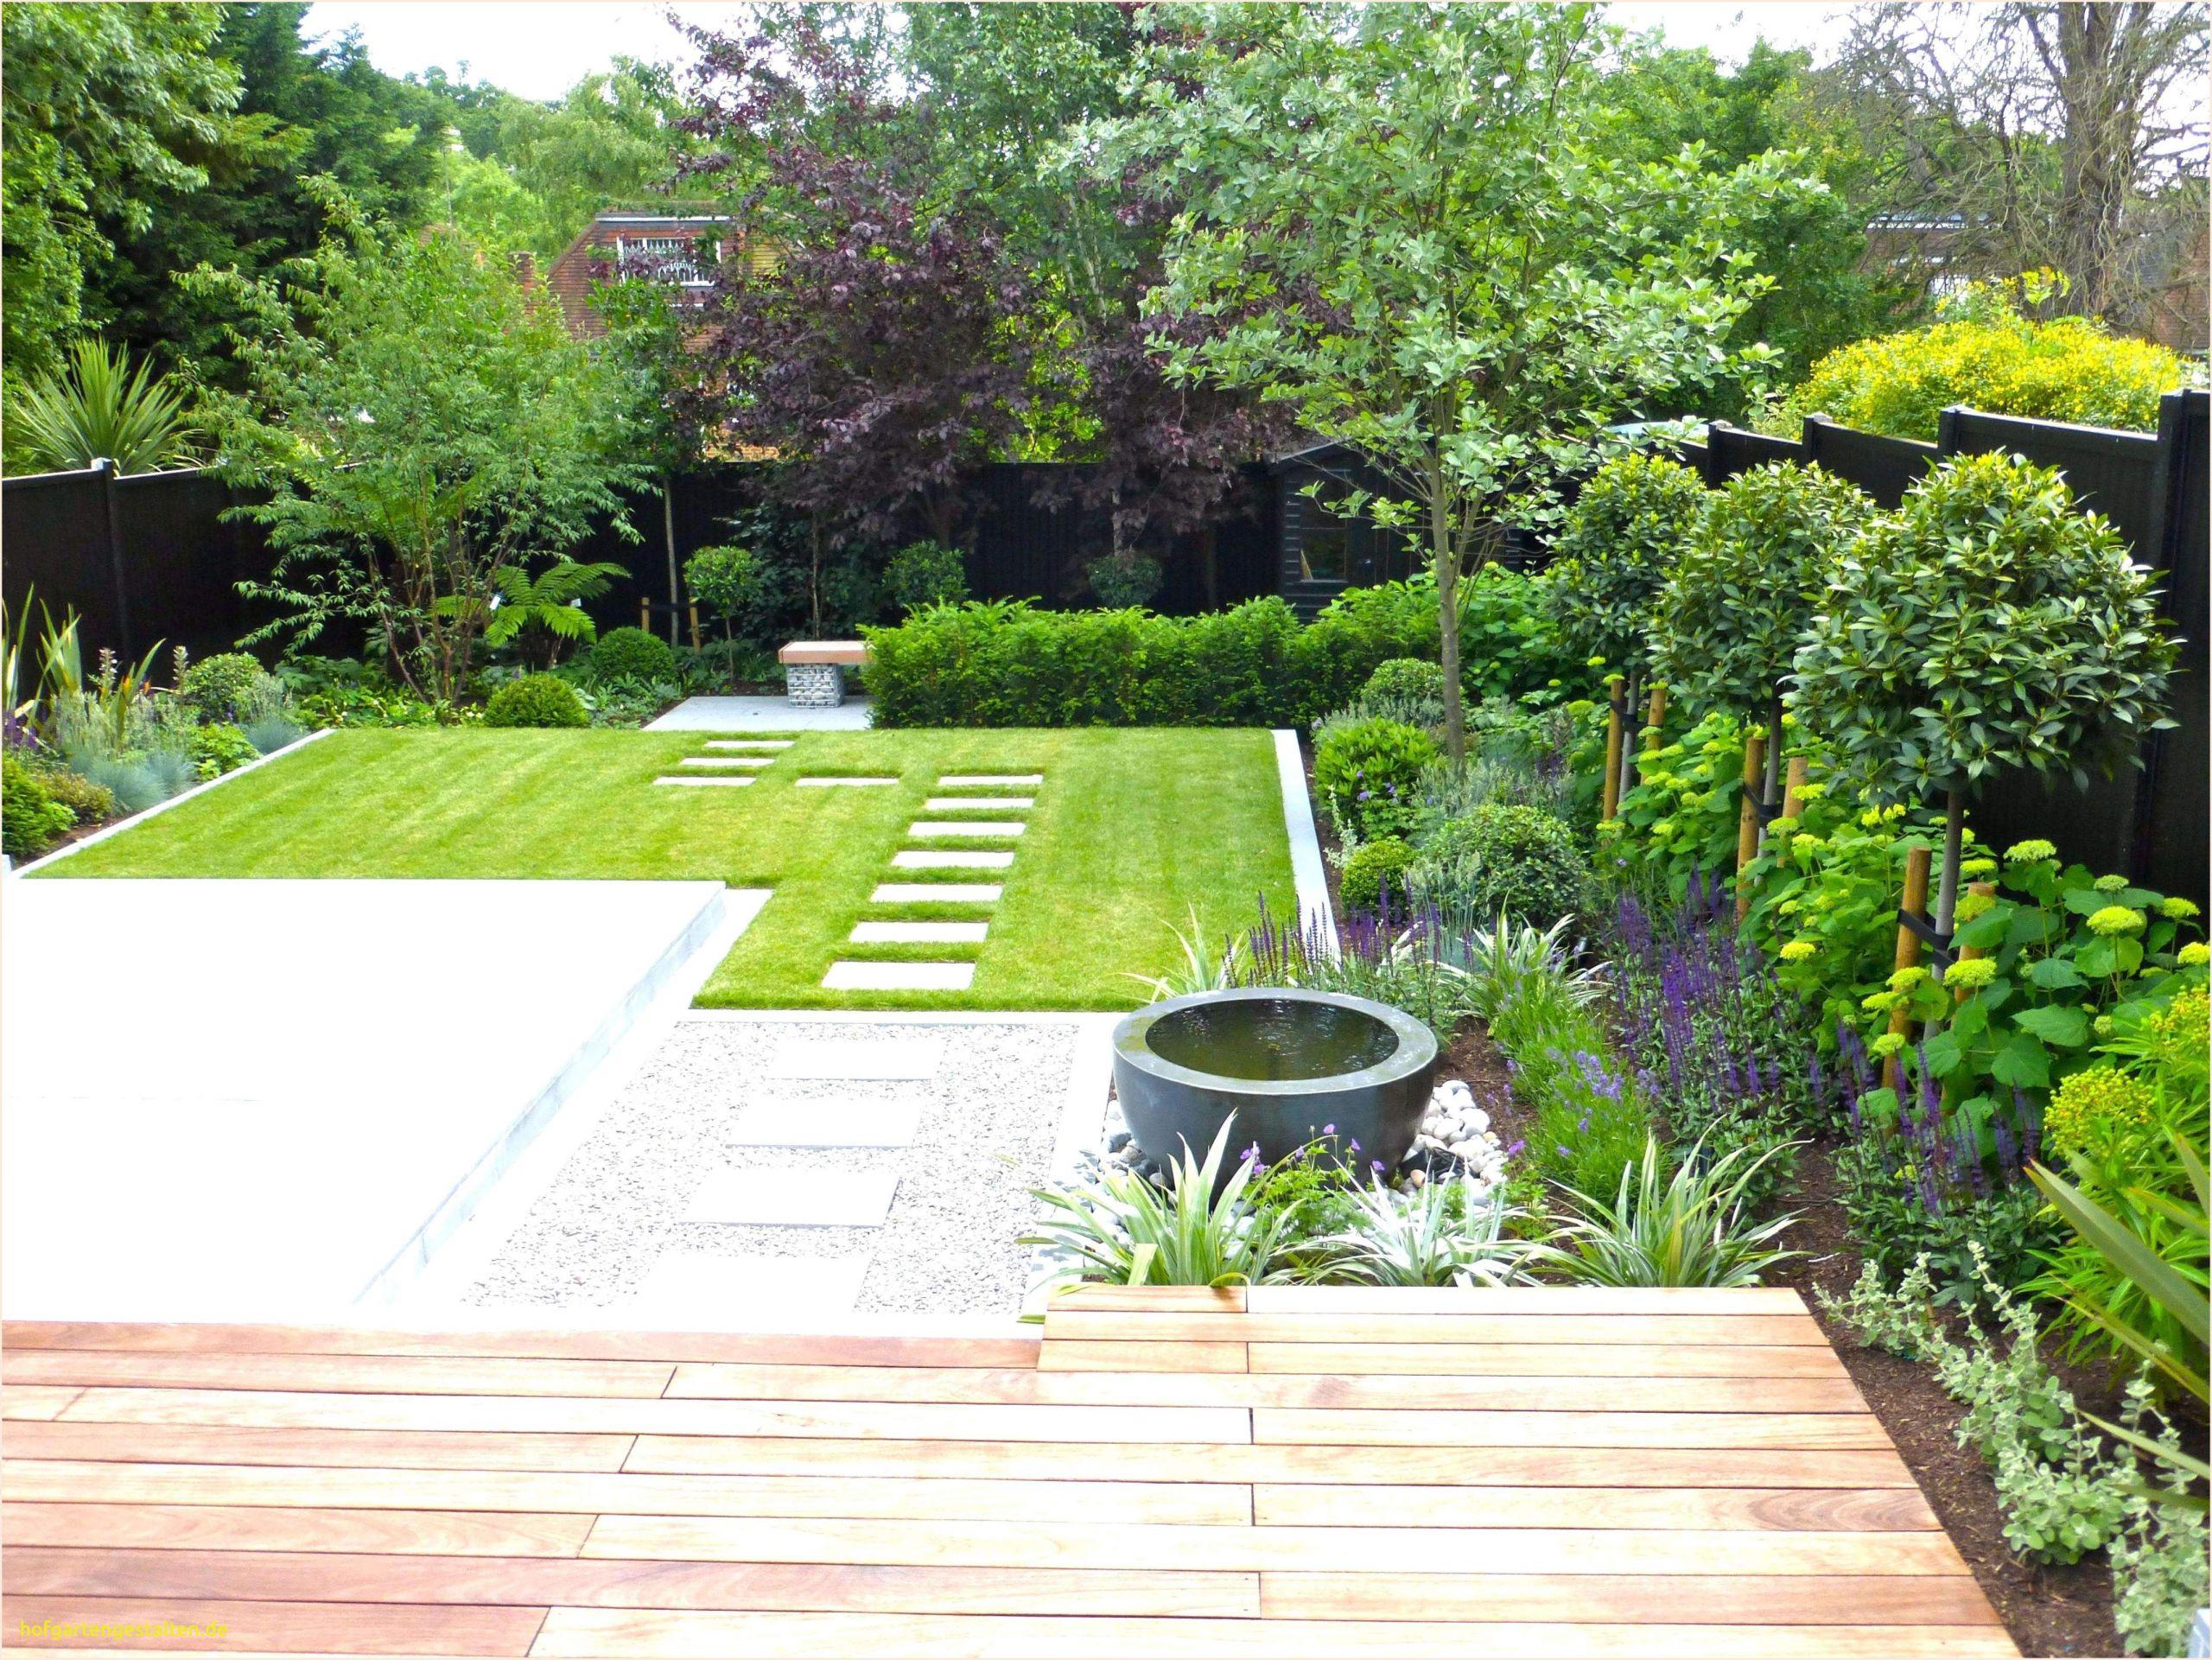 Holz Deko Garten Luxus Deko Garten Selber Machen — Temobardz Home Blog